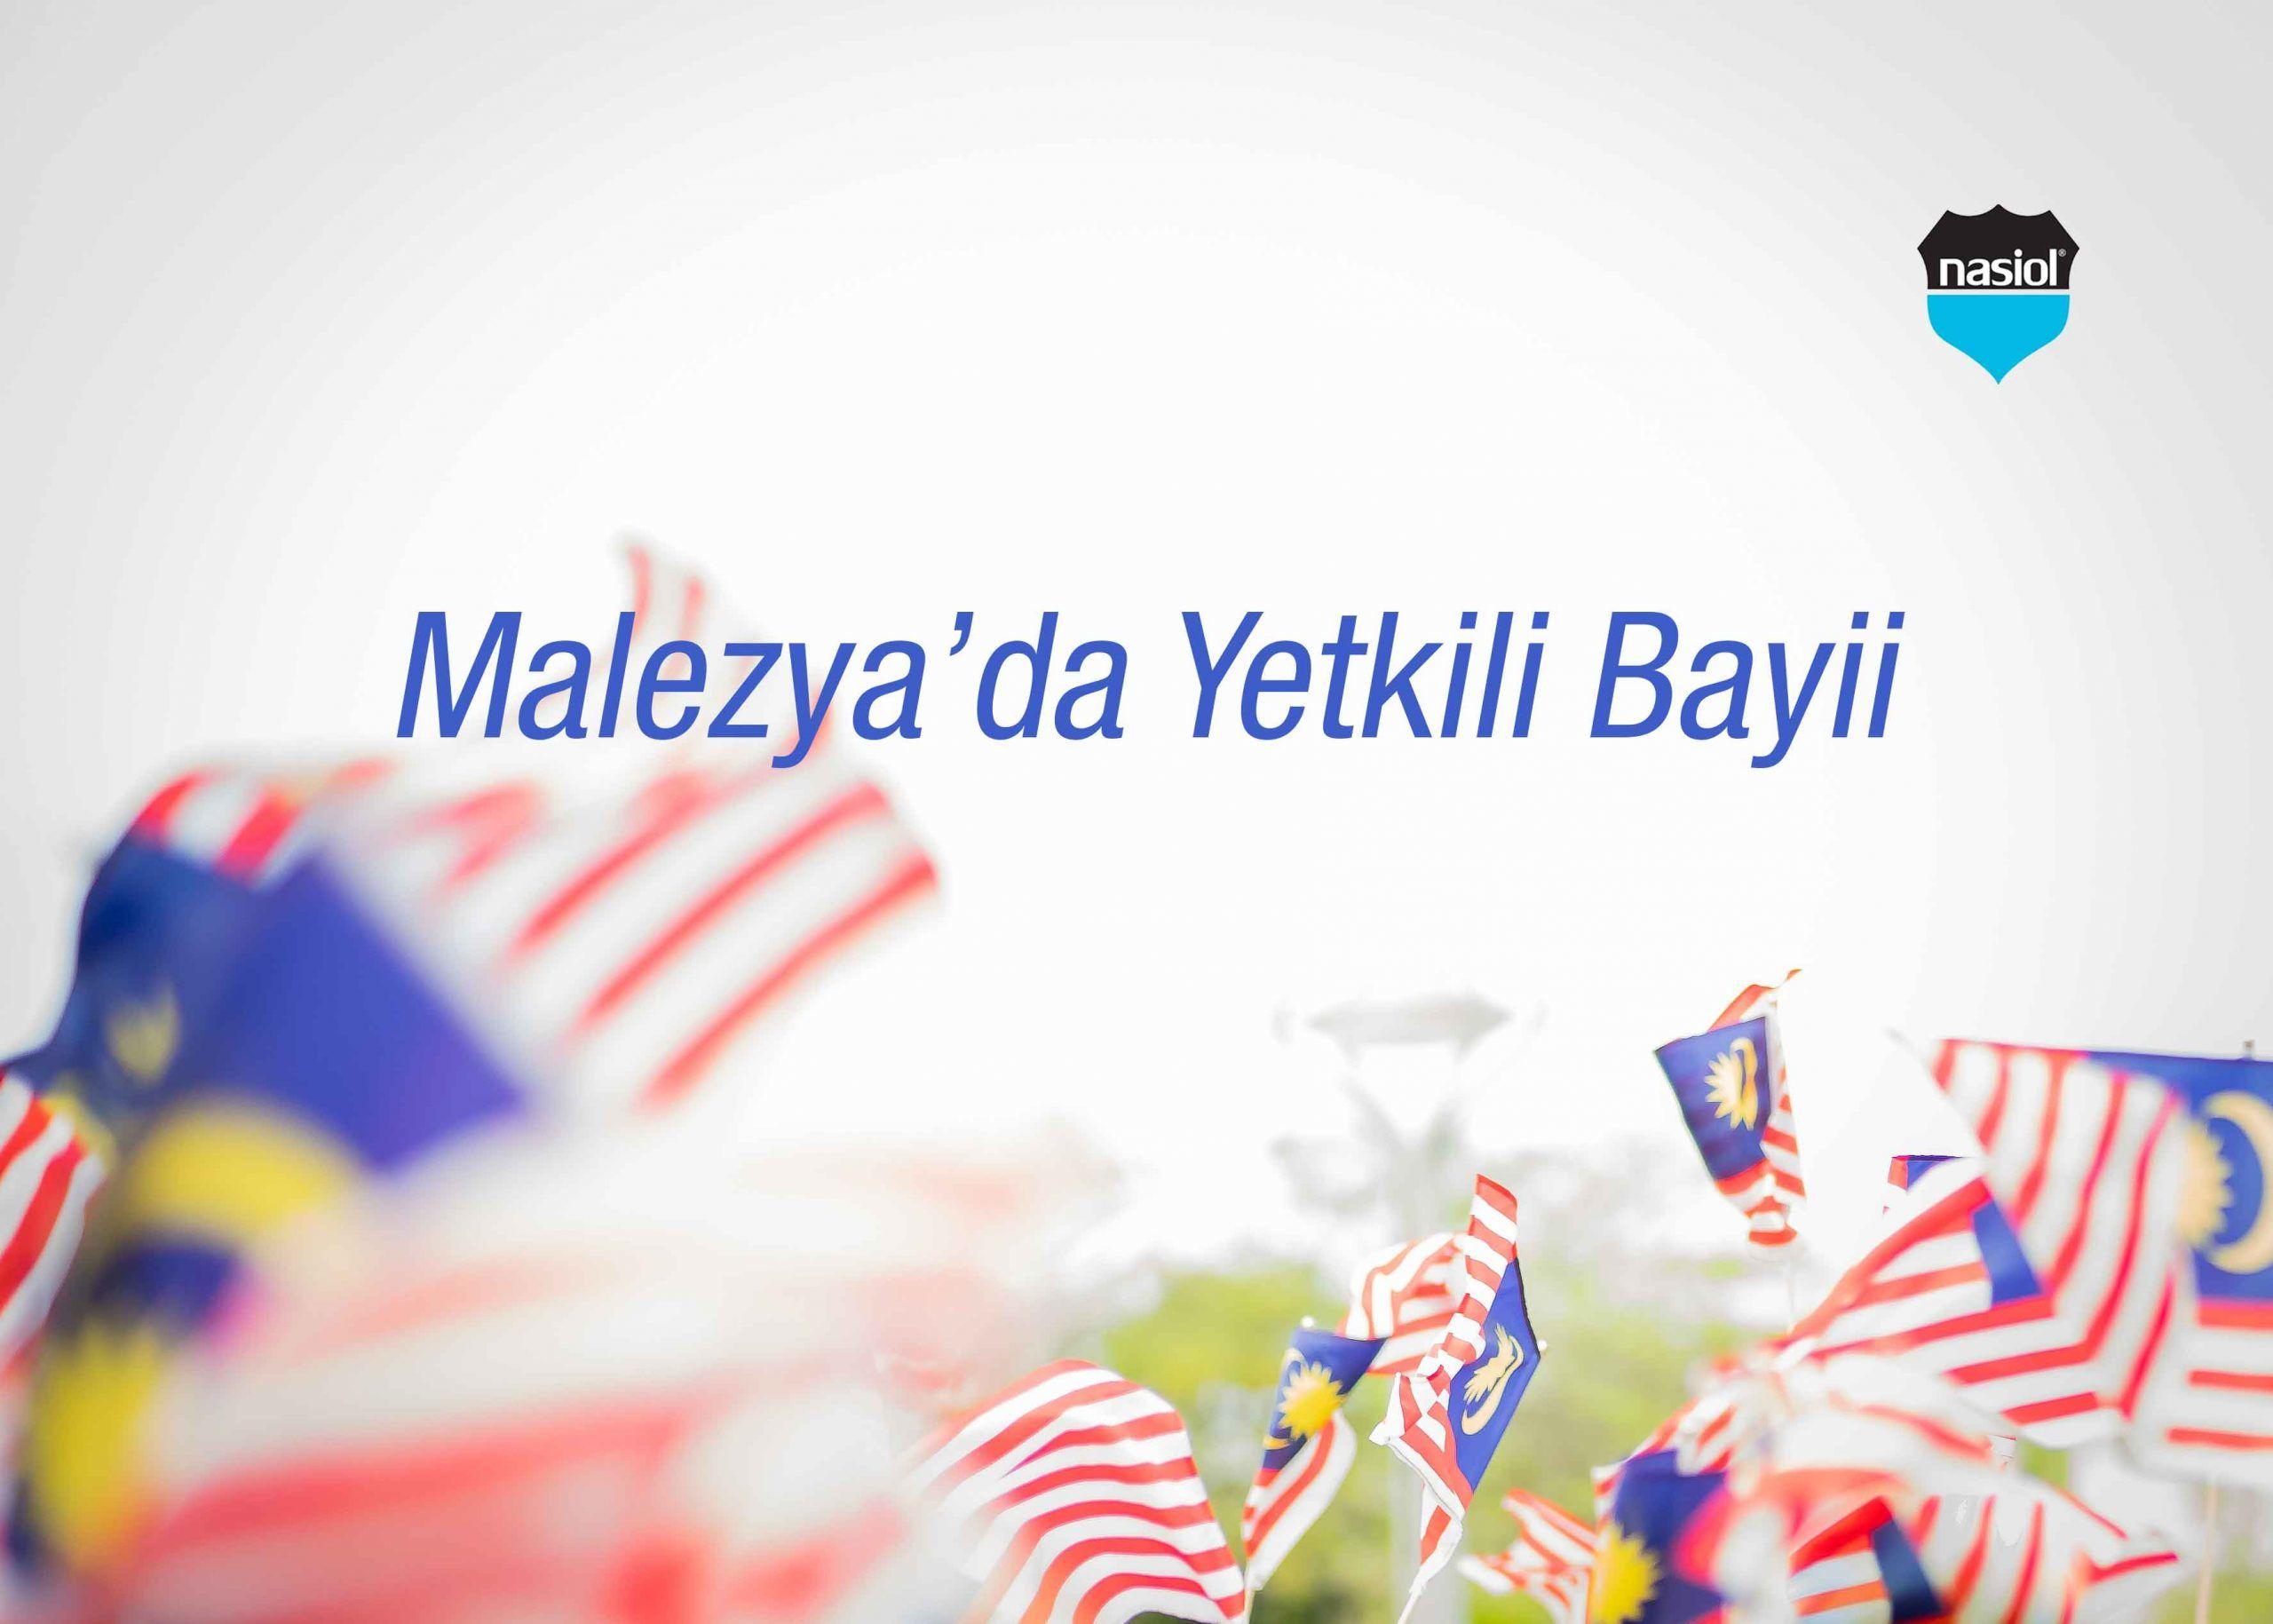 Malezya'da yeni Nasiol Yetkili Bayii.